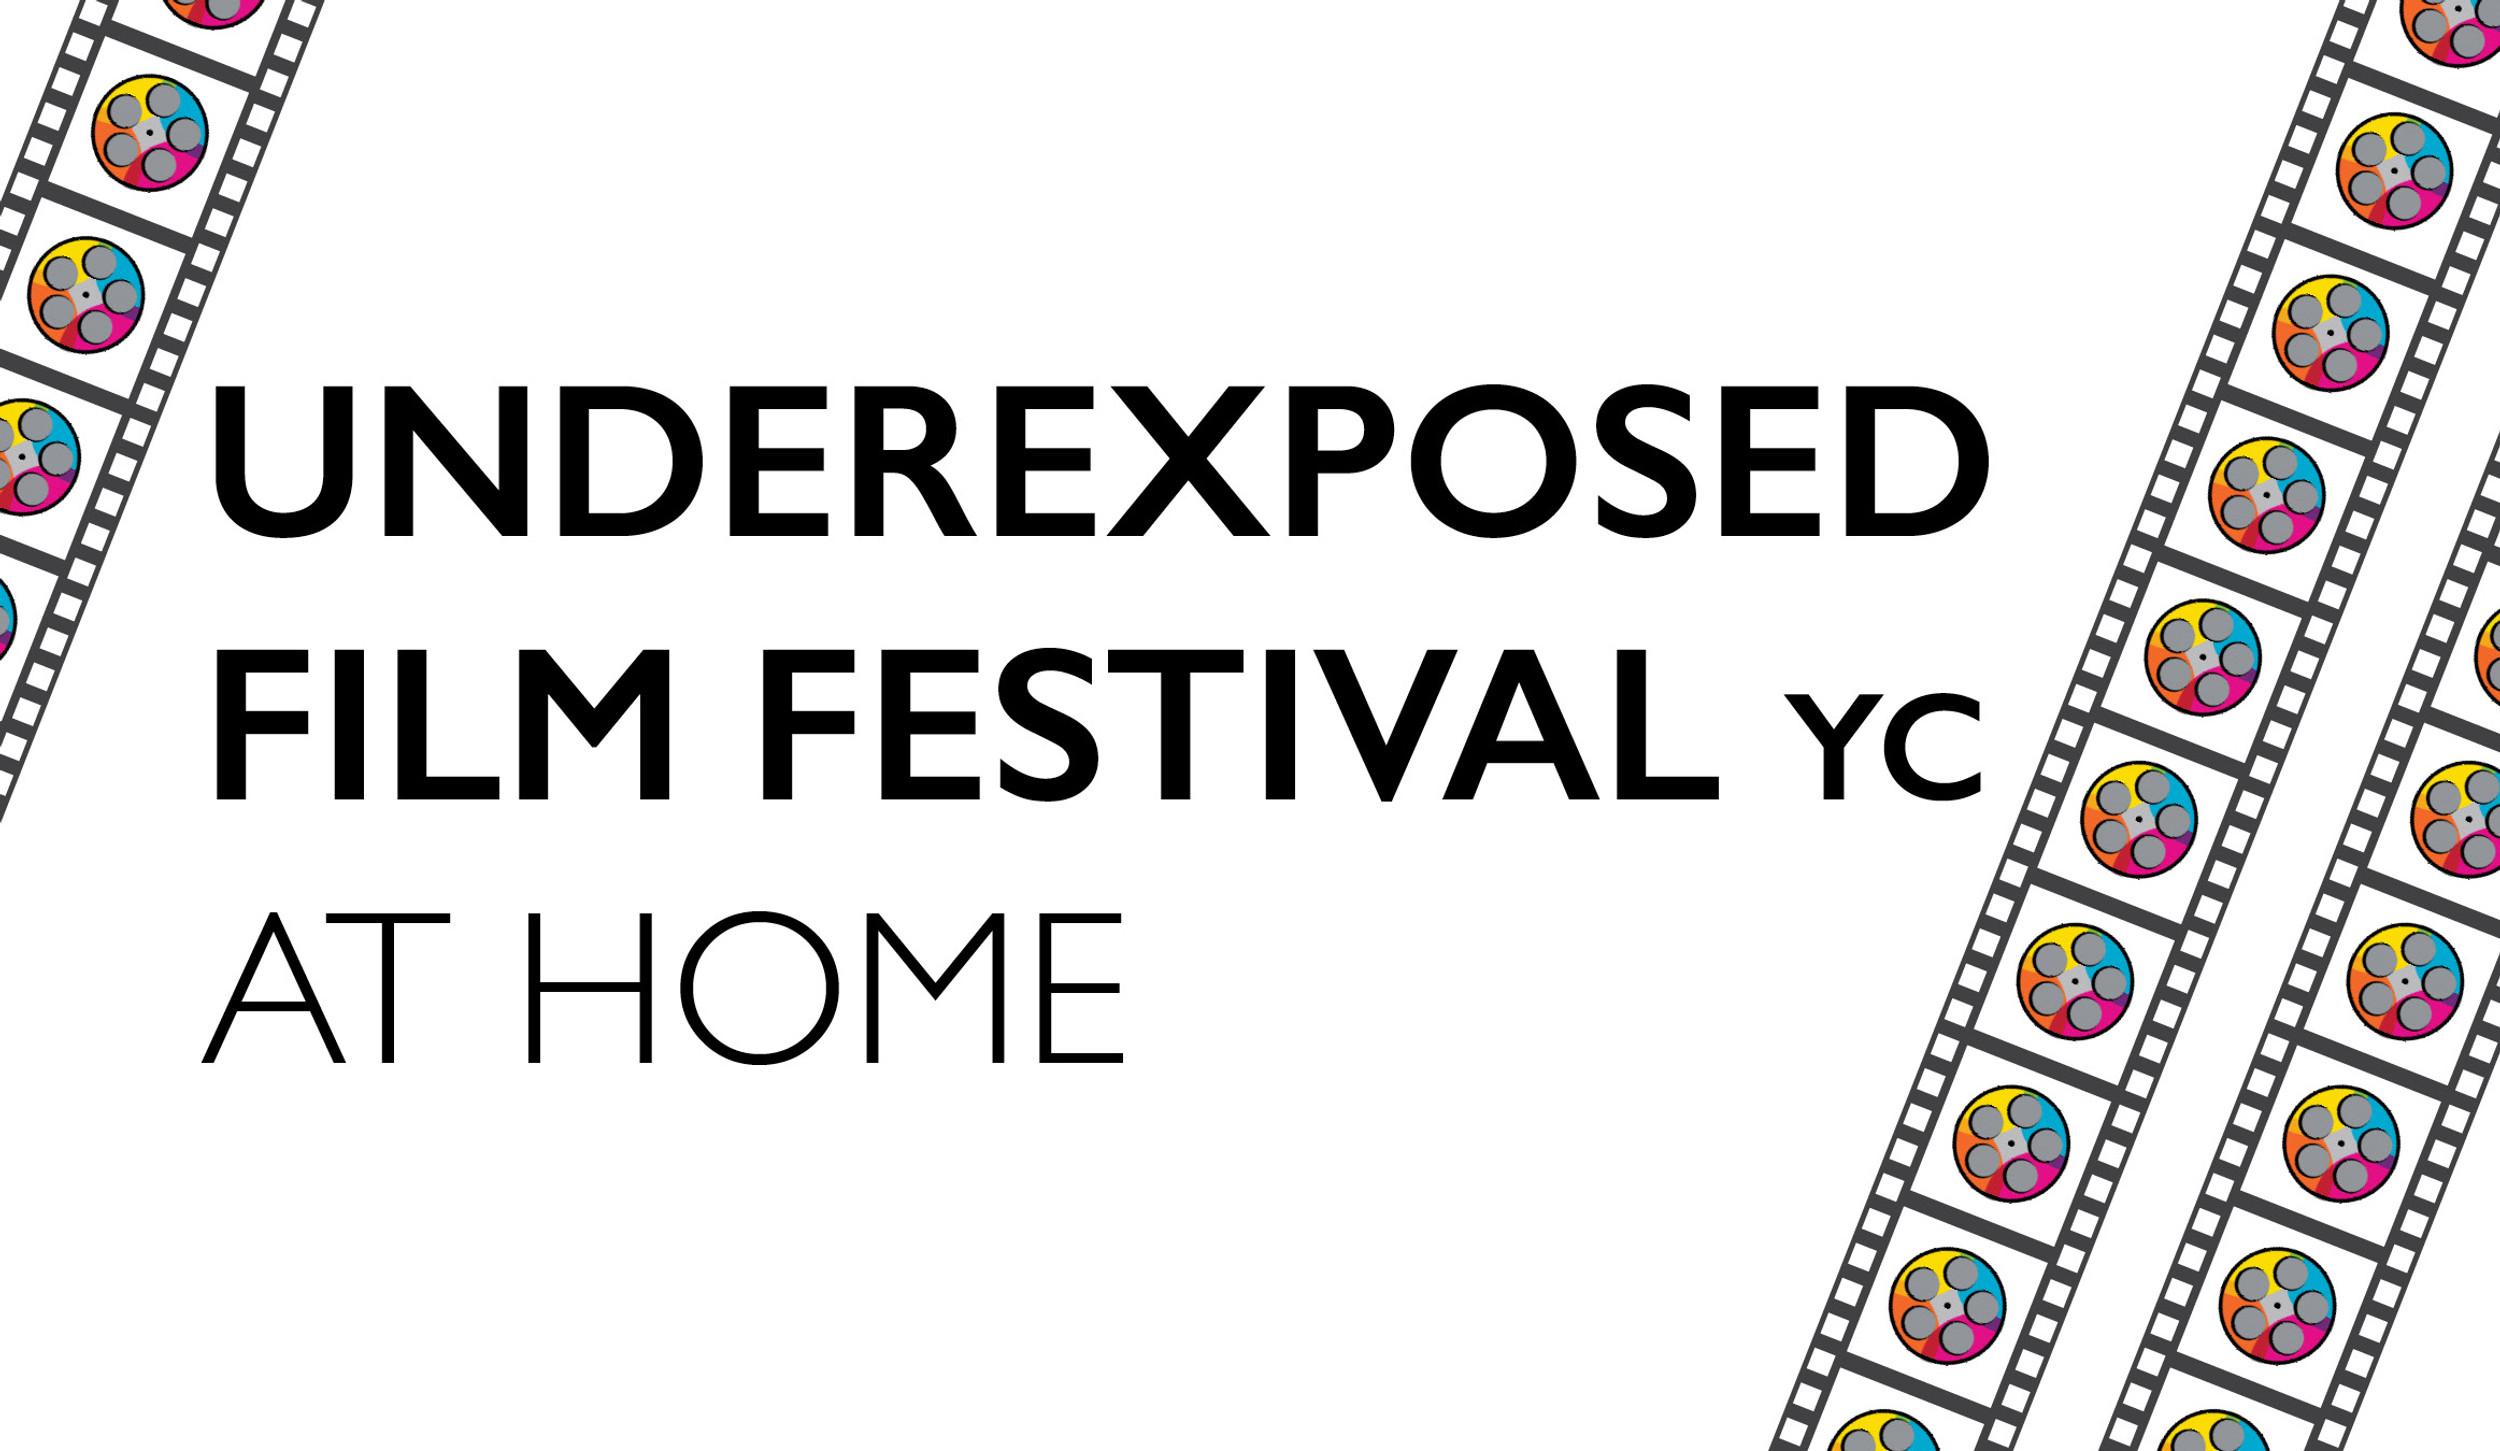 Underexposed Film Festival yc at Home